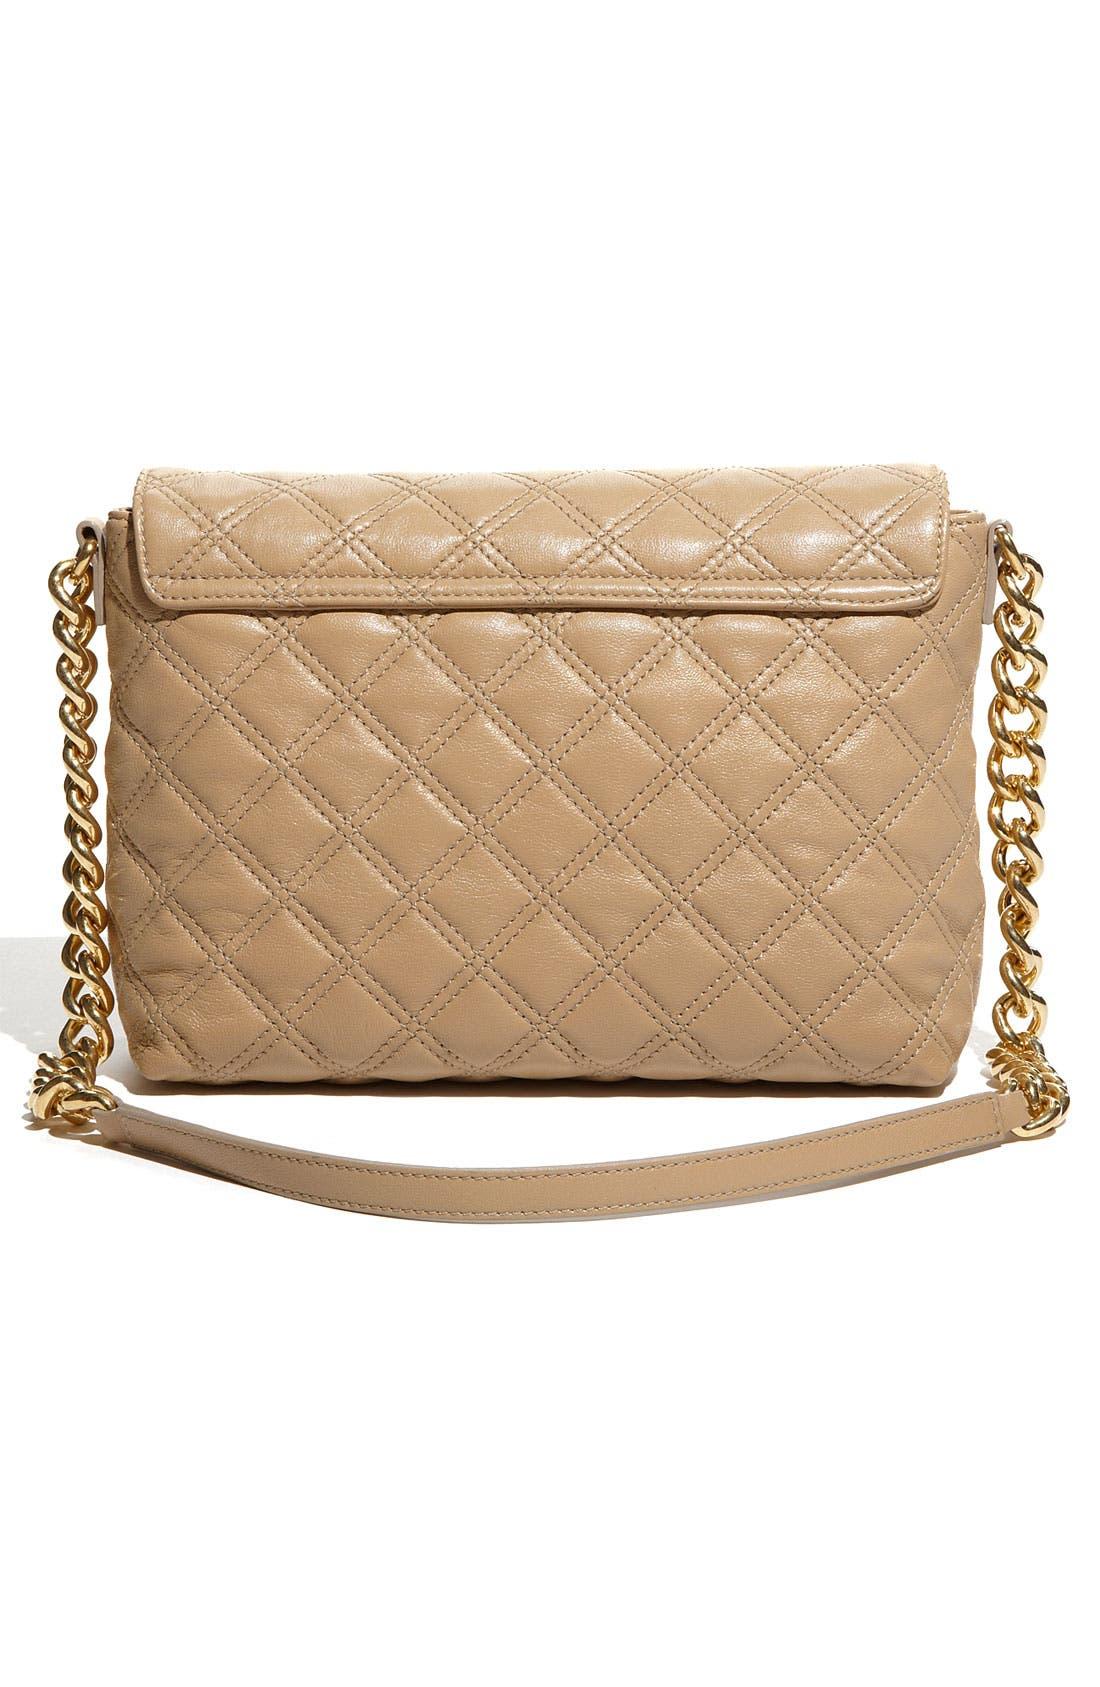 ,                             'Large Quilting Single' Leather Shoulder Bag,                             Alternate thumbnail 29, color,                             255